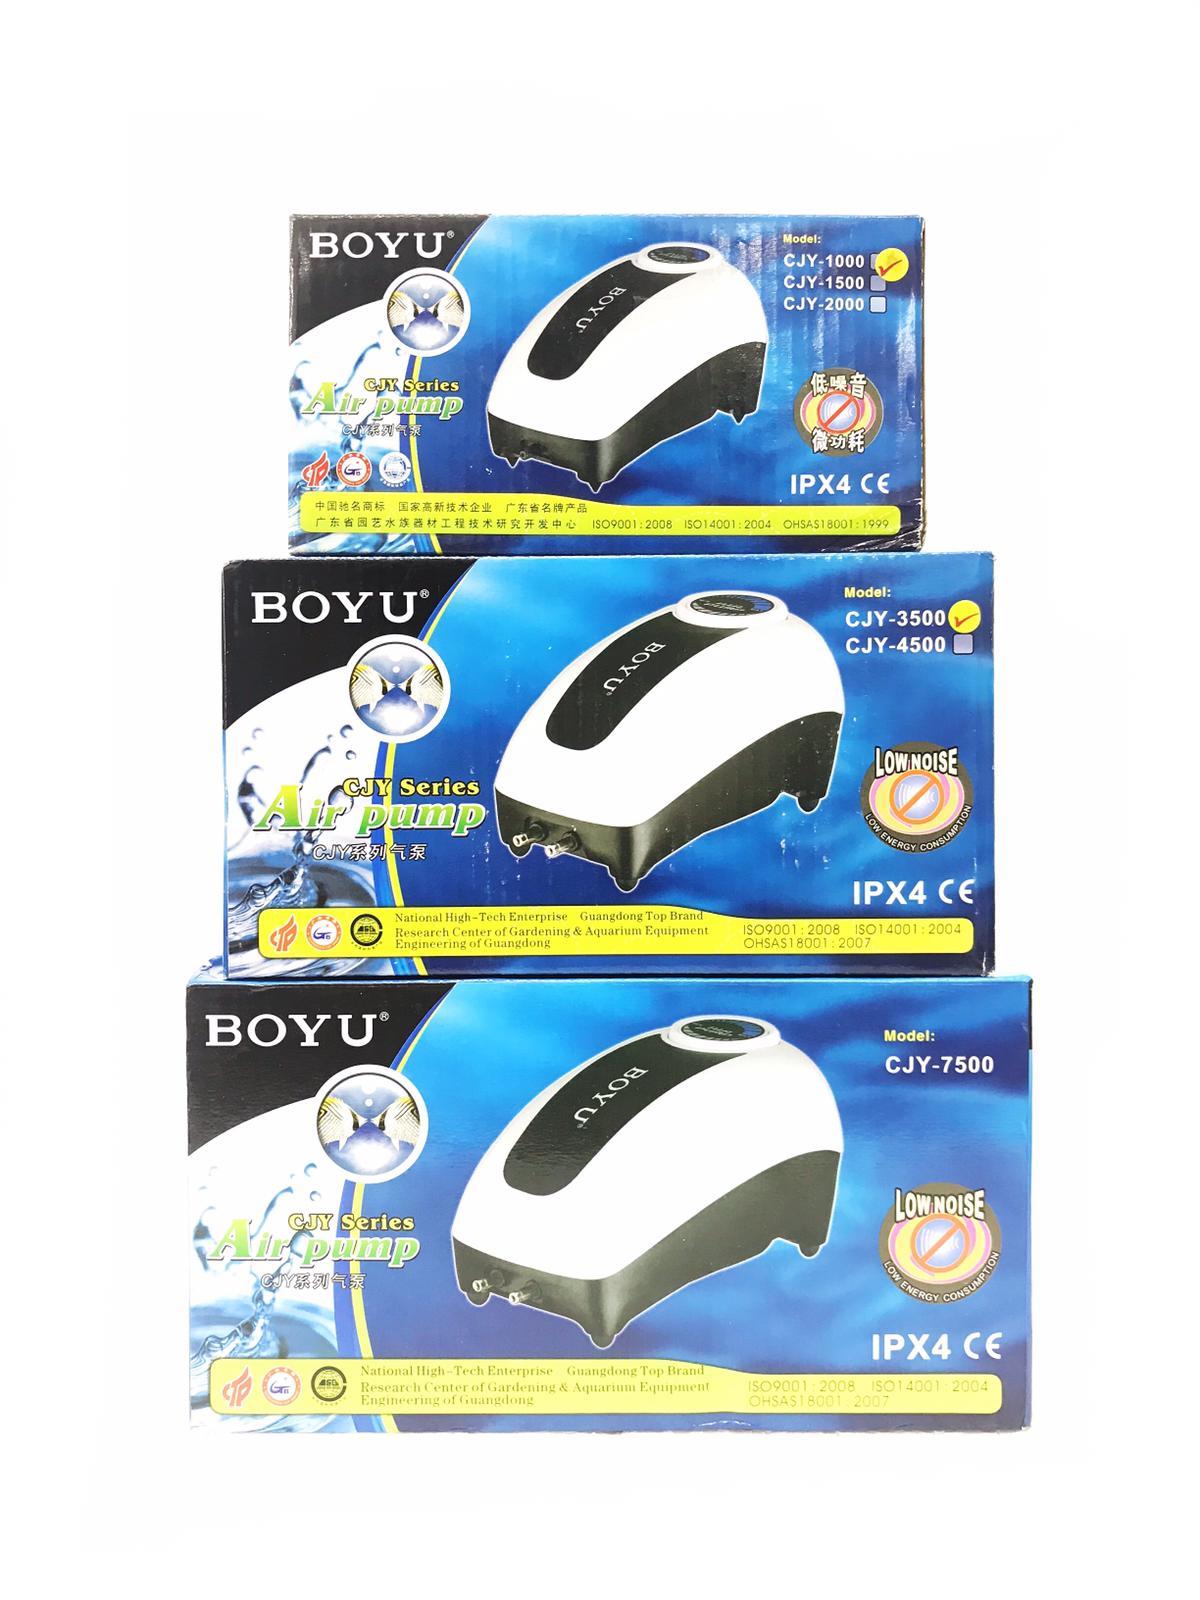 Boyu Cyj Series Air Pump